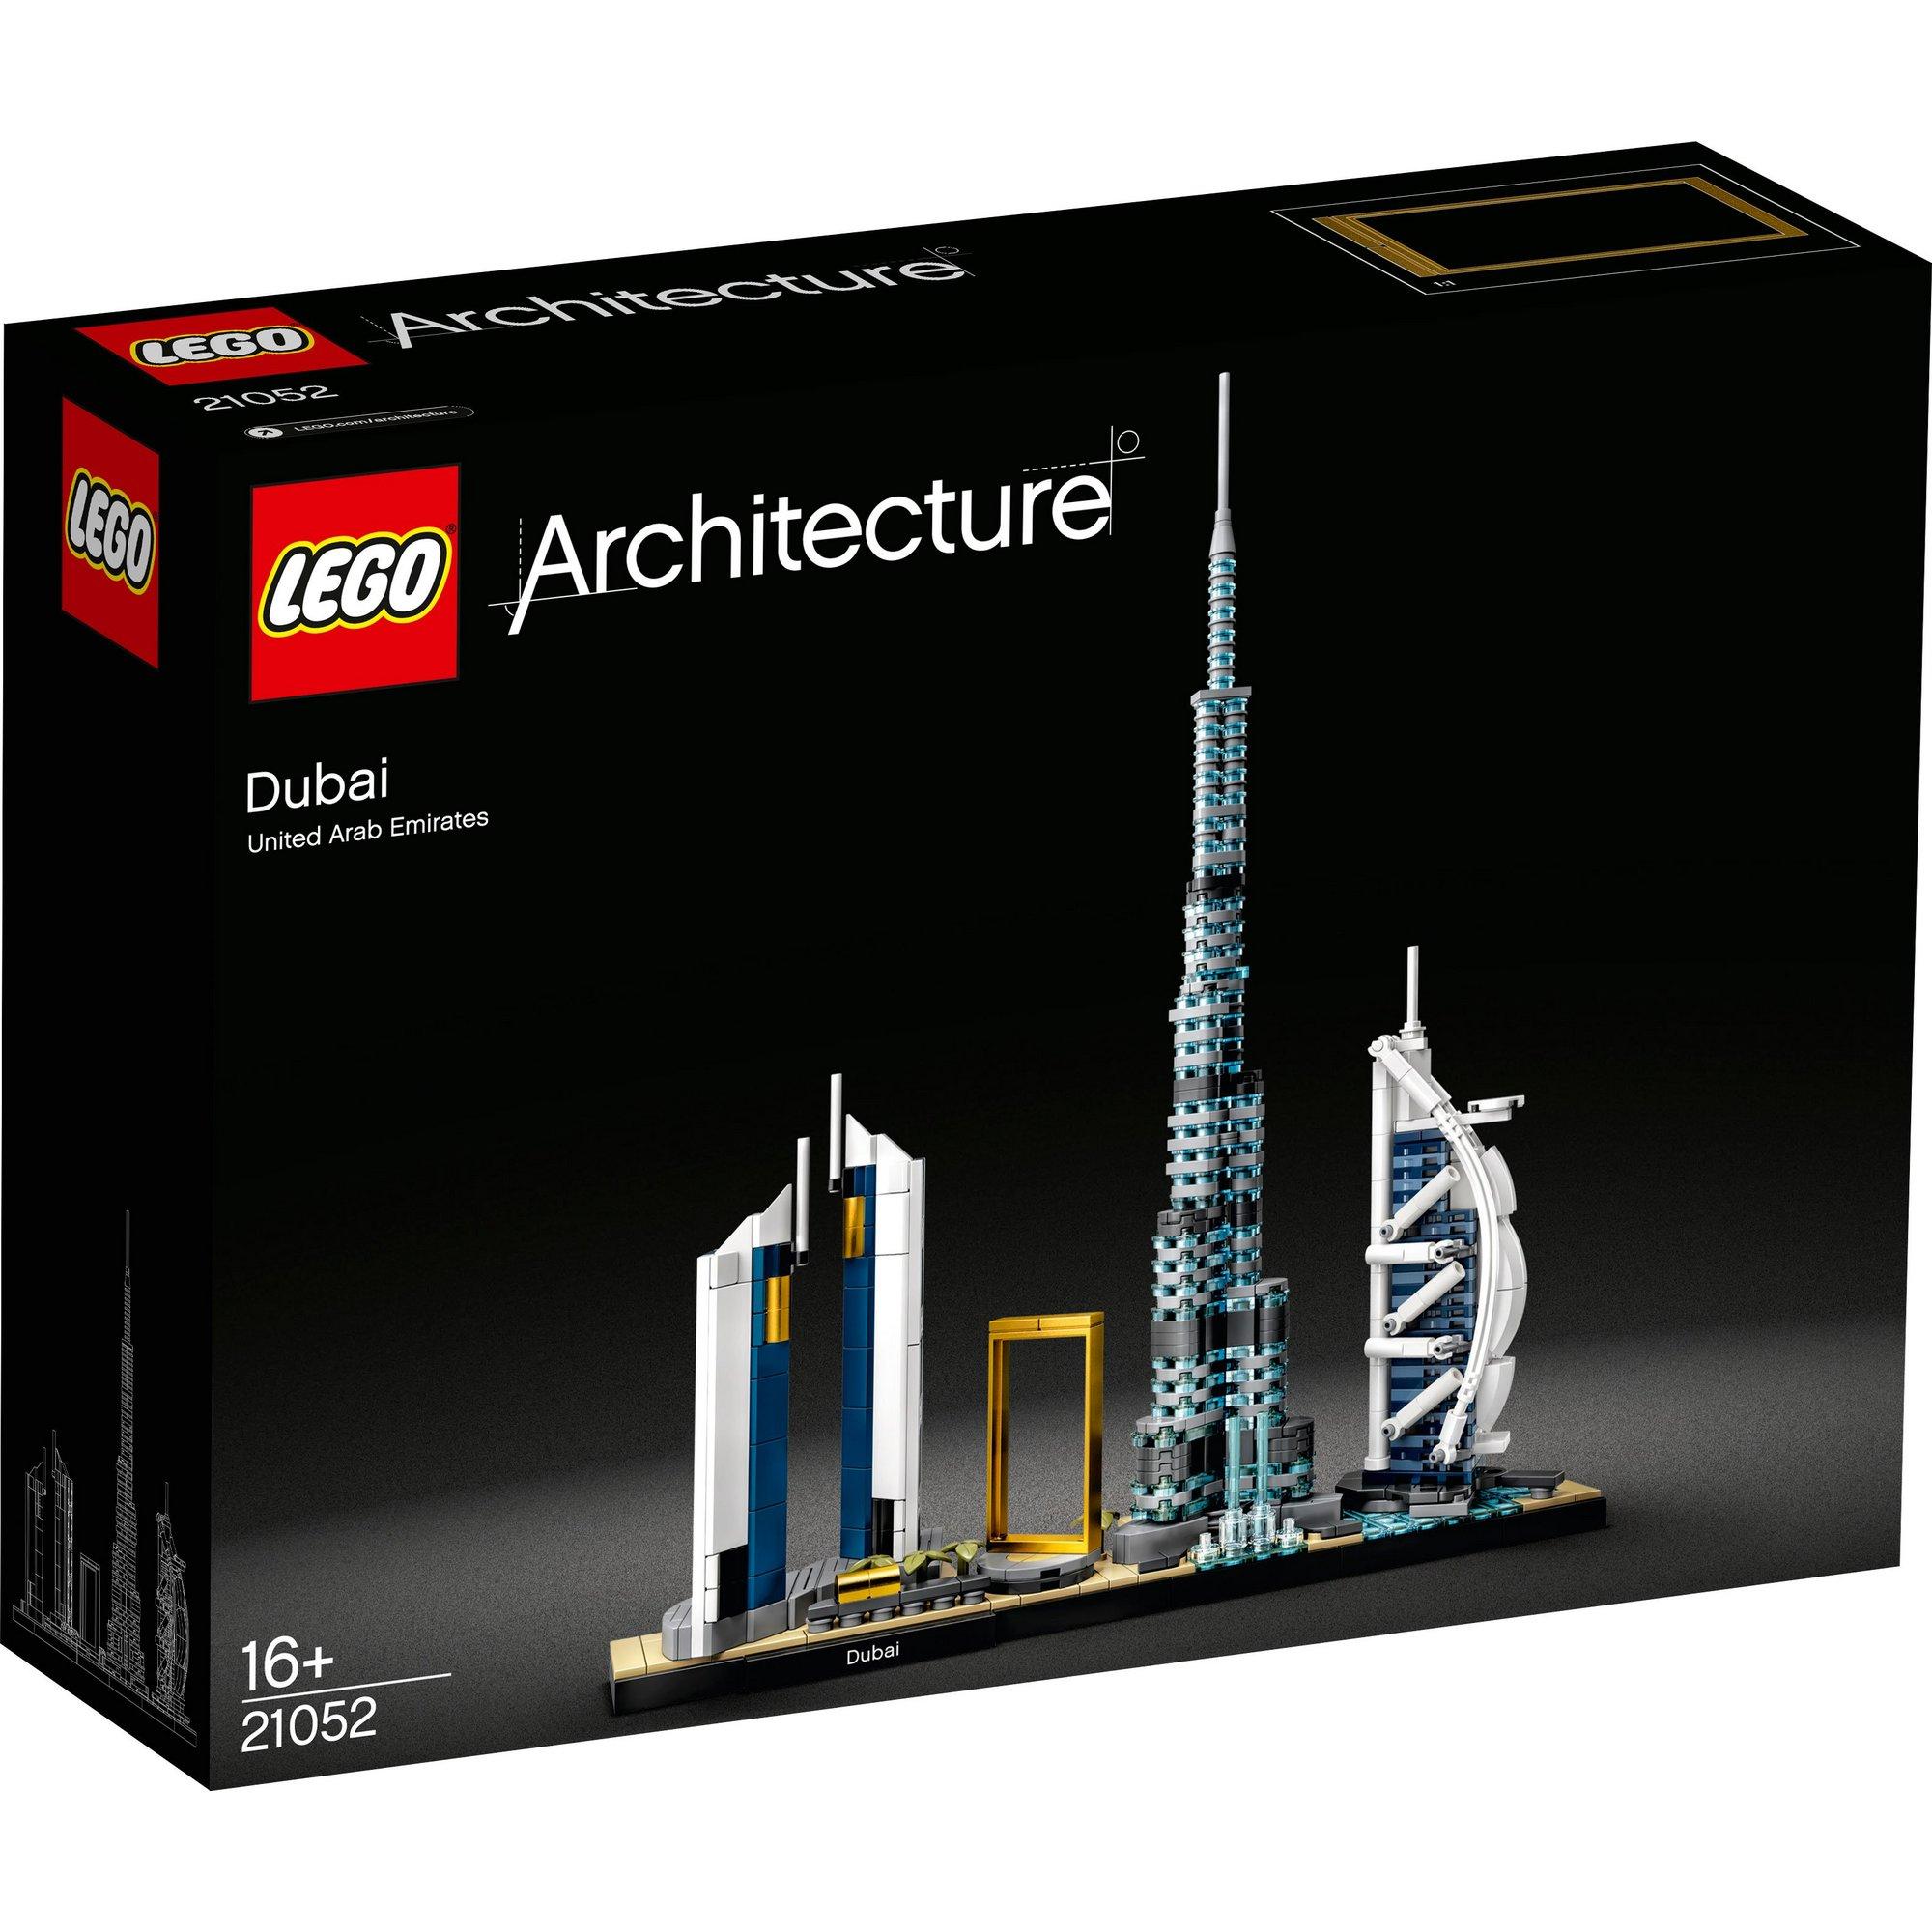 Image of LEGO Architecture Dubai